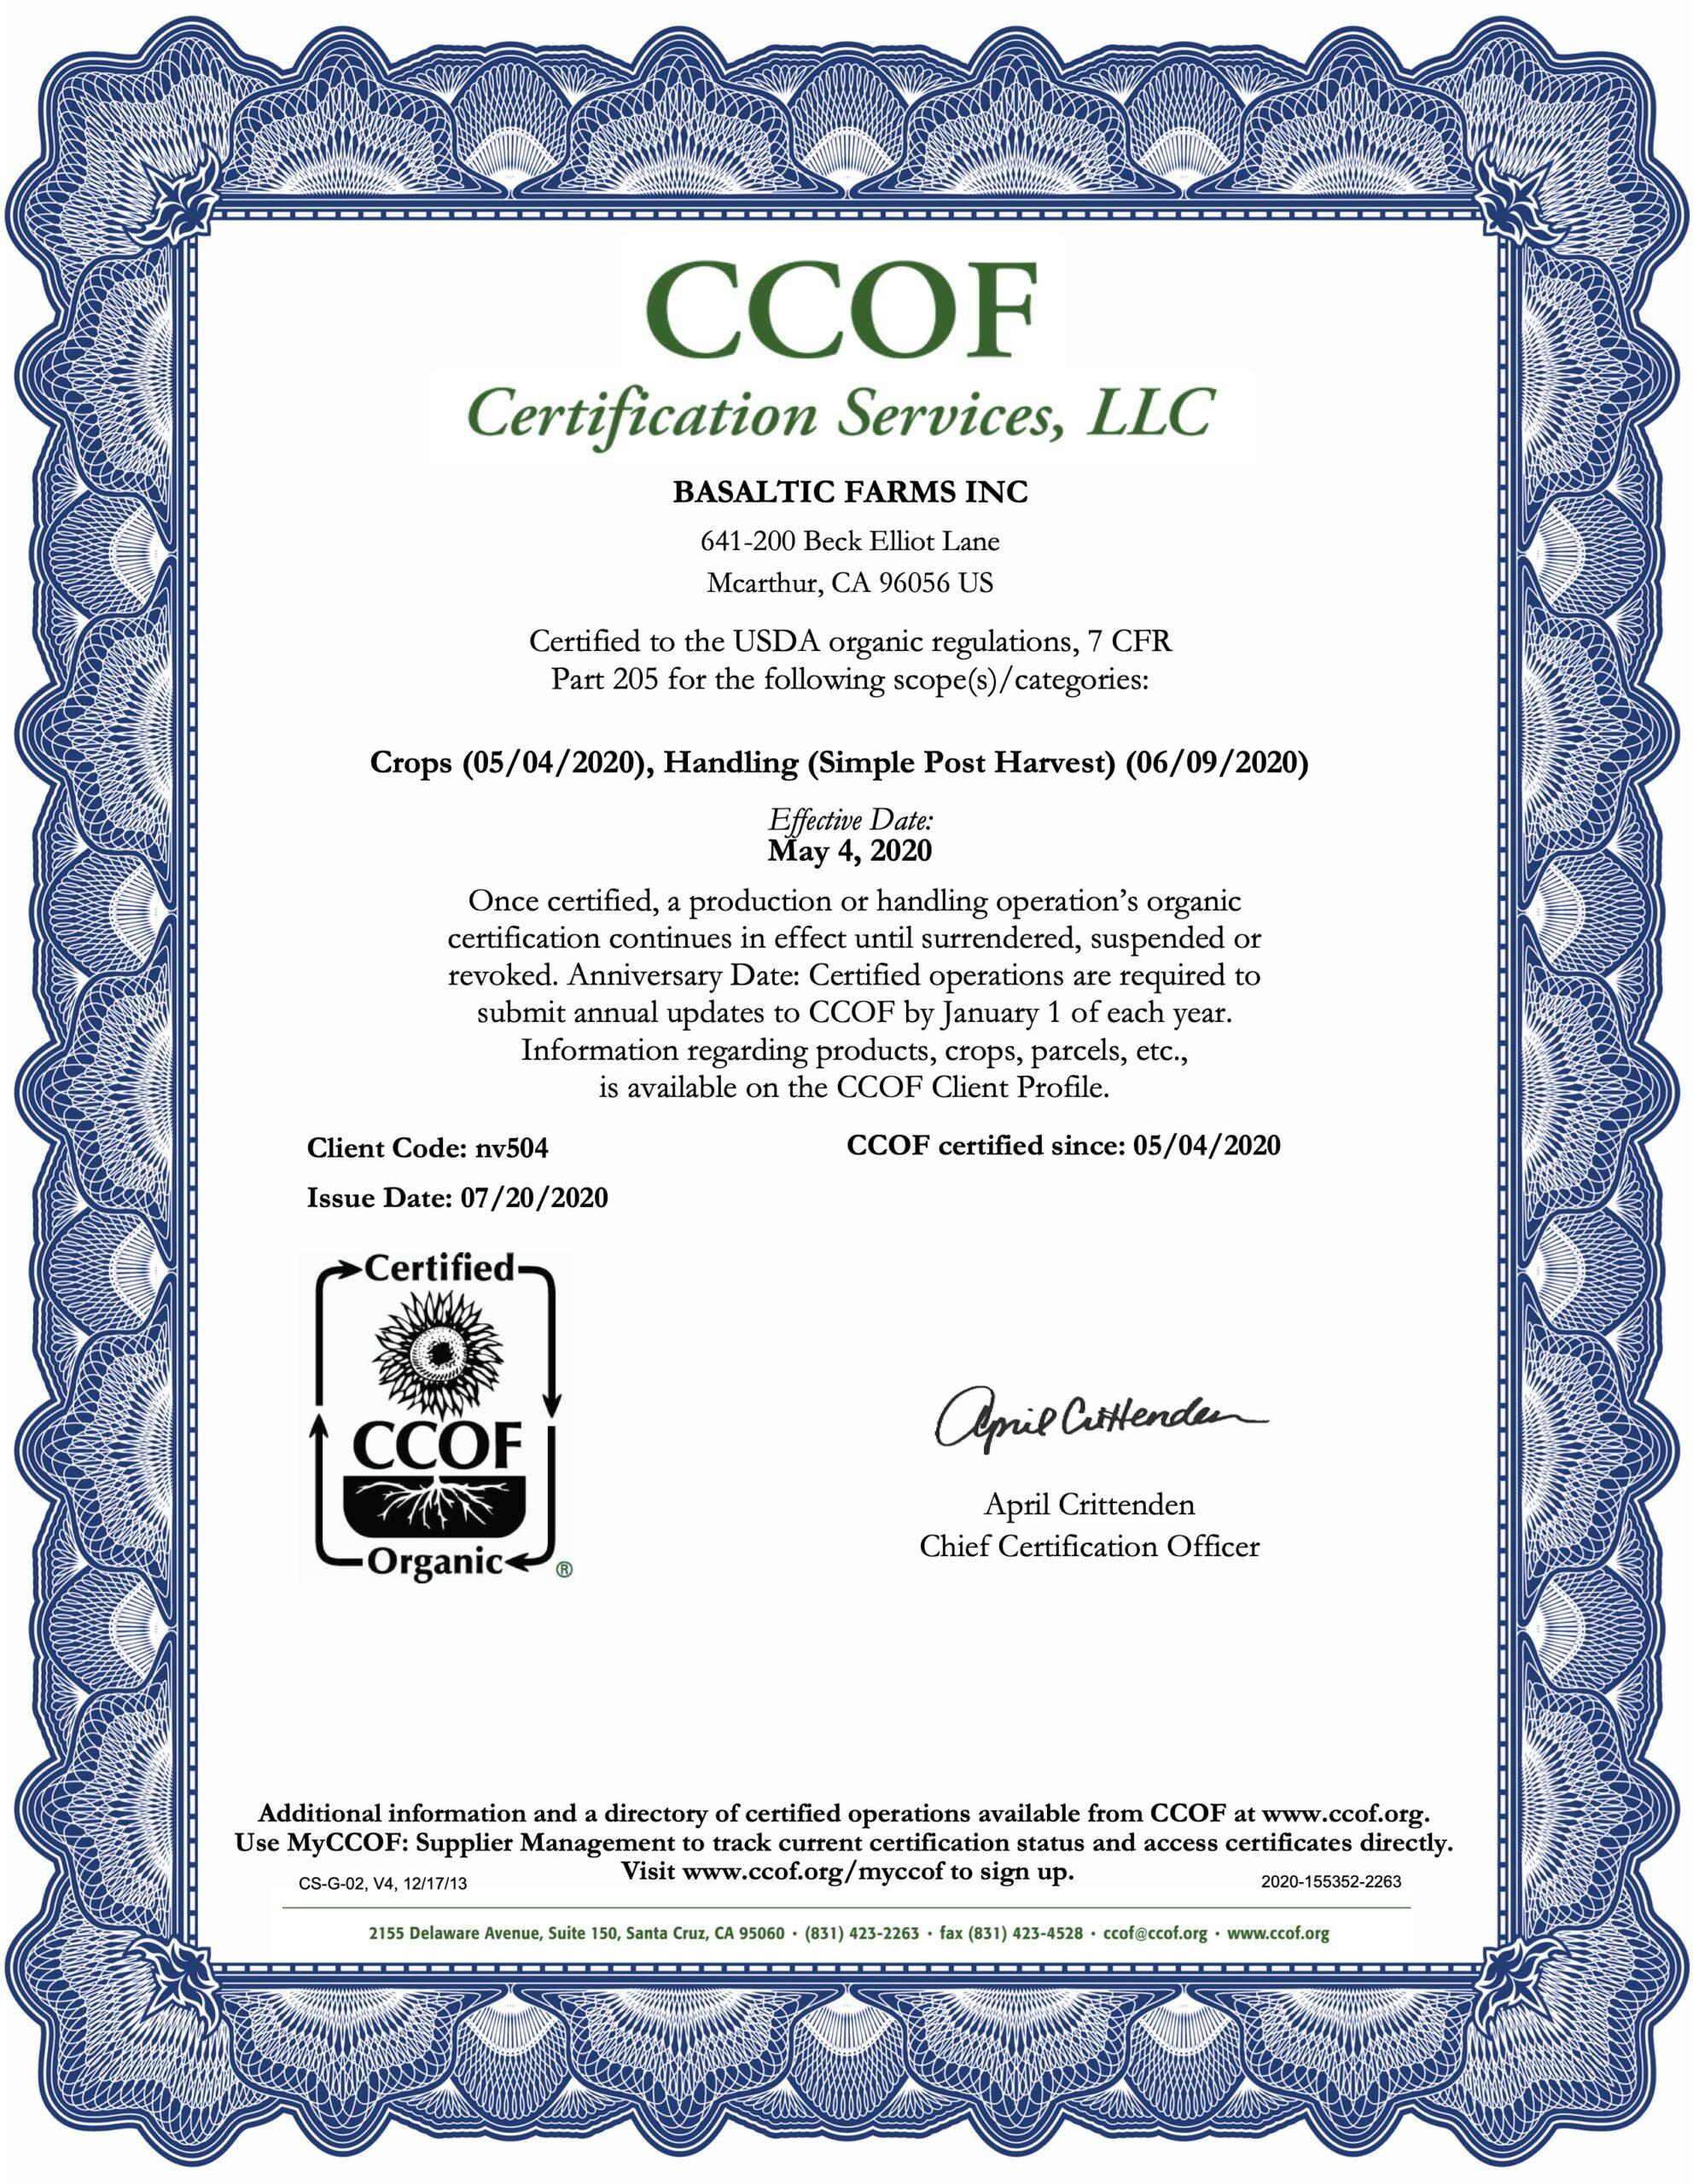 Certified California Organic Garlic Farm - Basaltic Farms